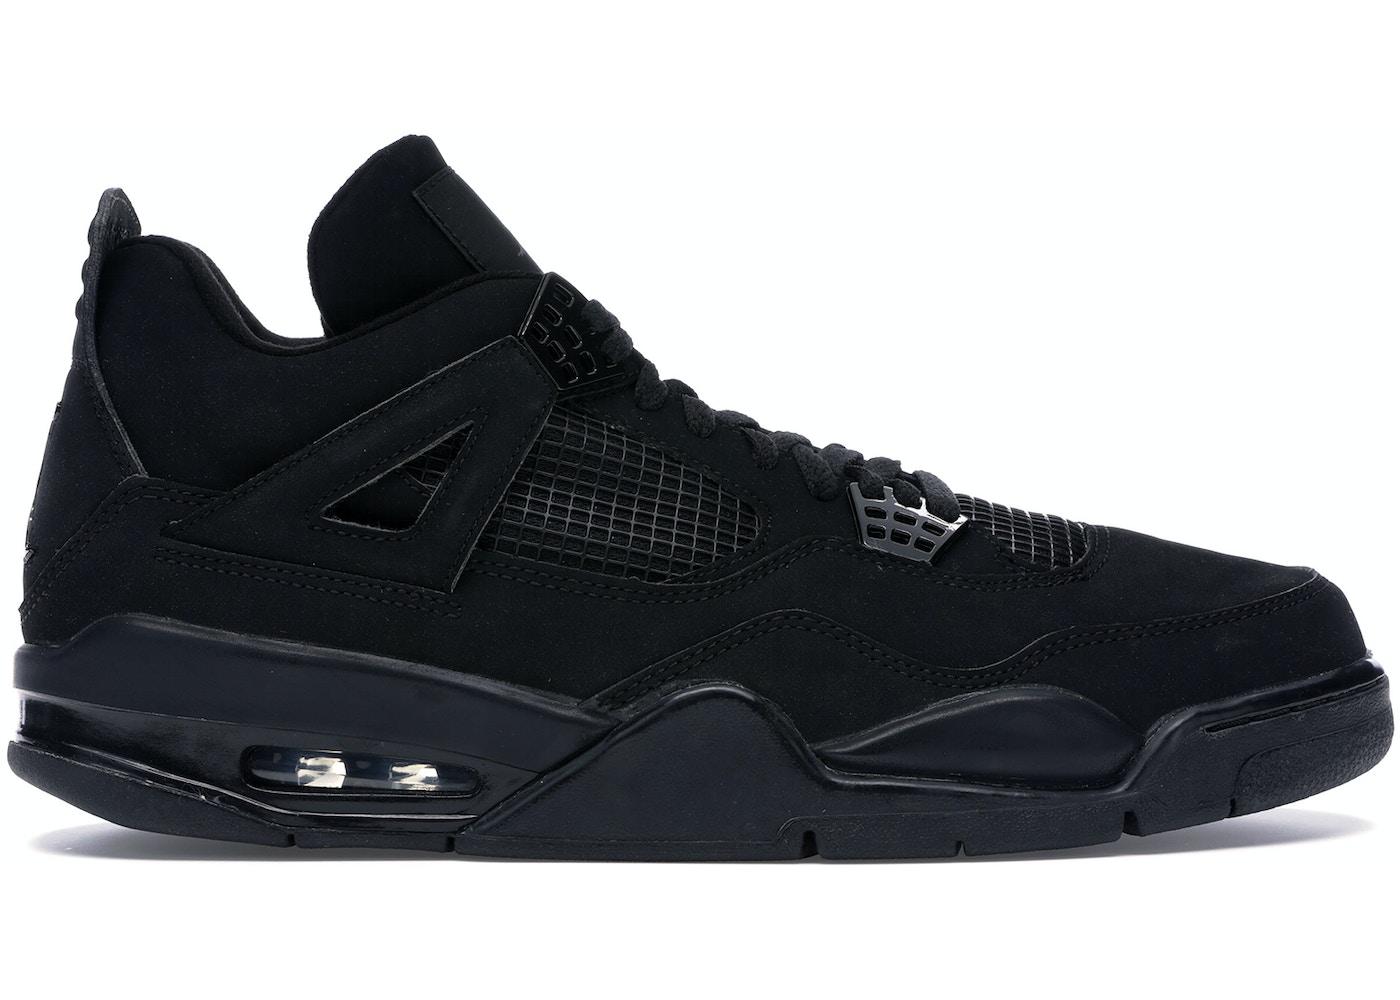 pretty nice 075bd 93ef2 Jordan 4 Retro Black Cats - 308497-002